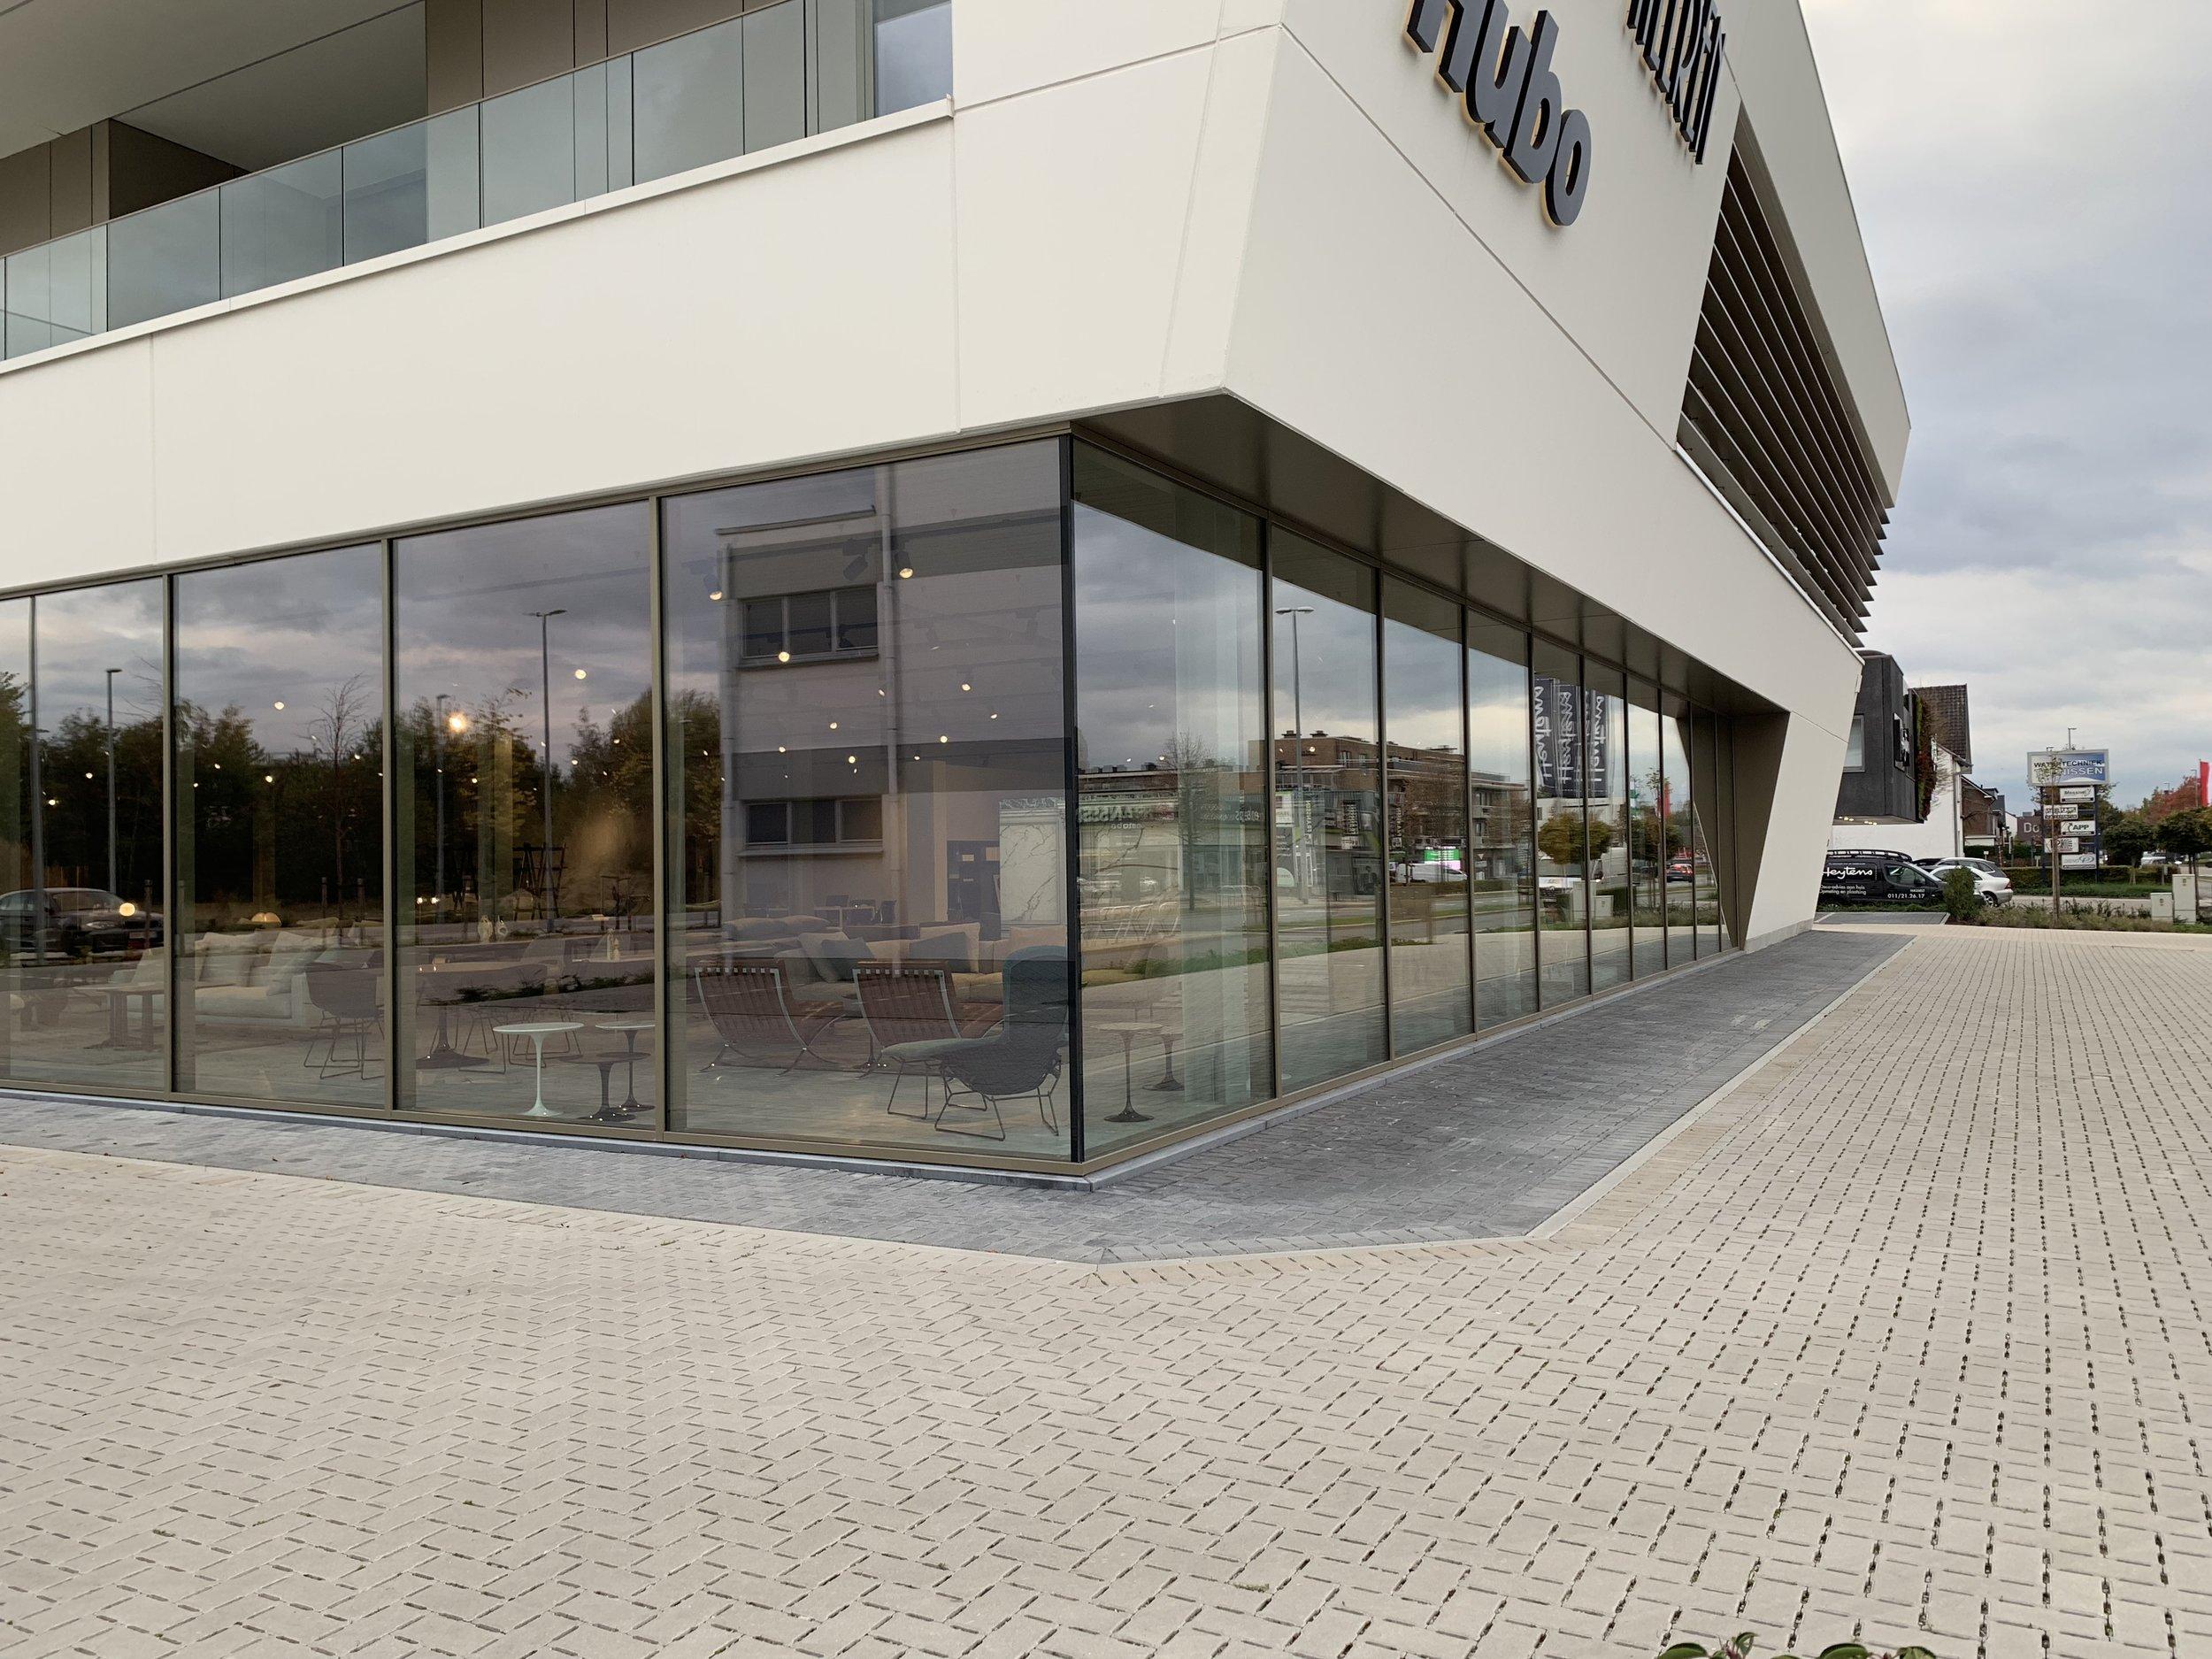 Loncin designmeubelwinkel genkersteenweg 195 3500 Hasselt Vitra Molteni Cassina Flexform Knoll Cor Jori Ligne Roset interieur meubels Loncin in Limburg.jpg